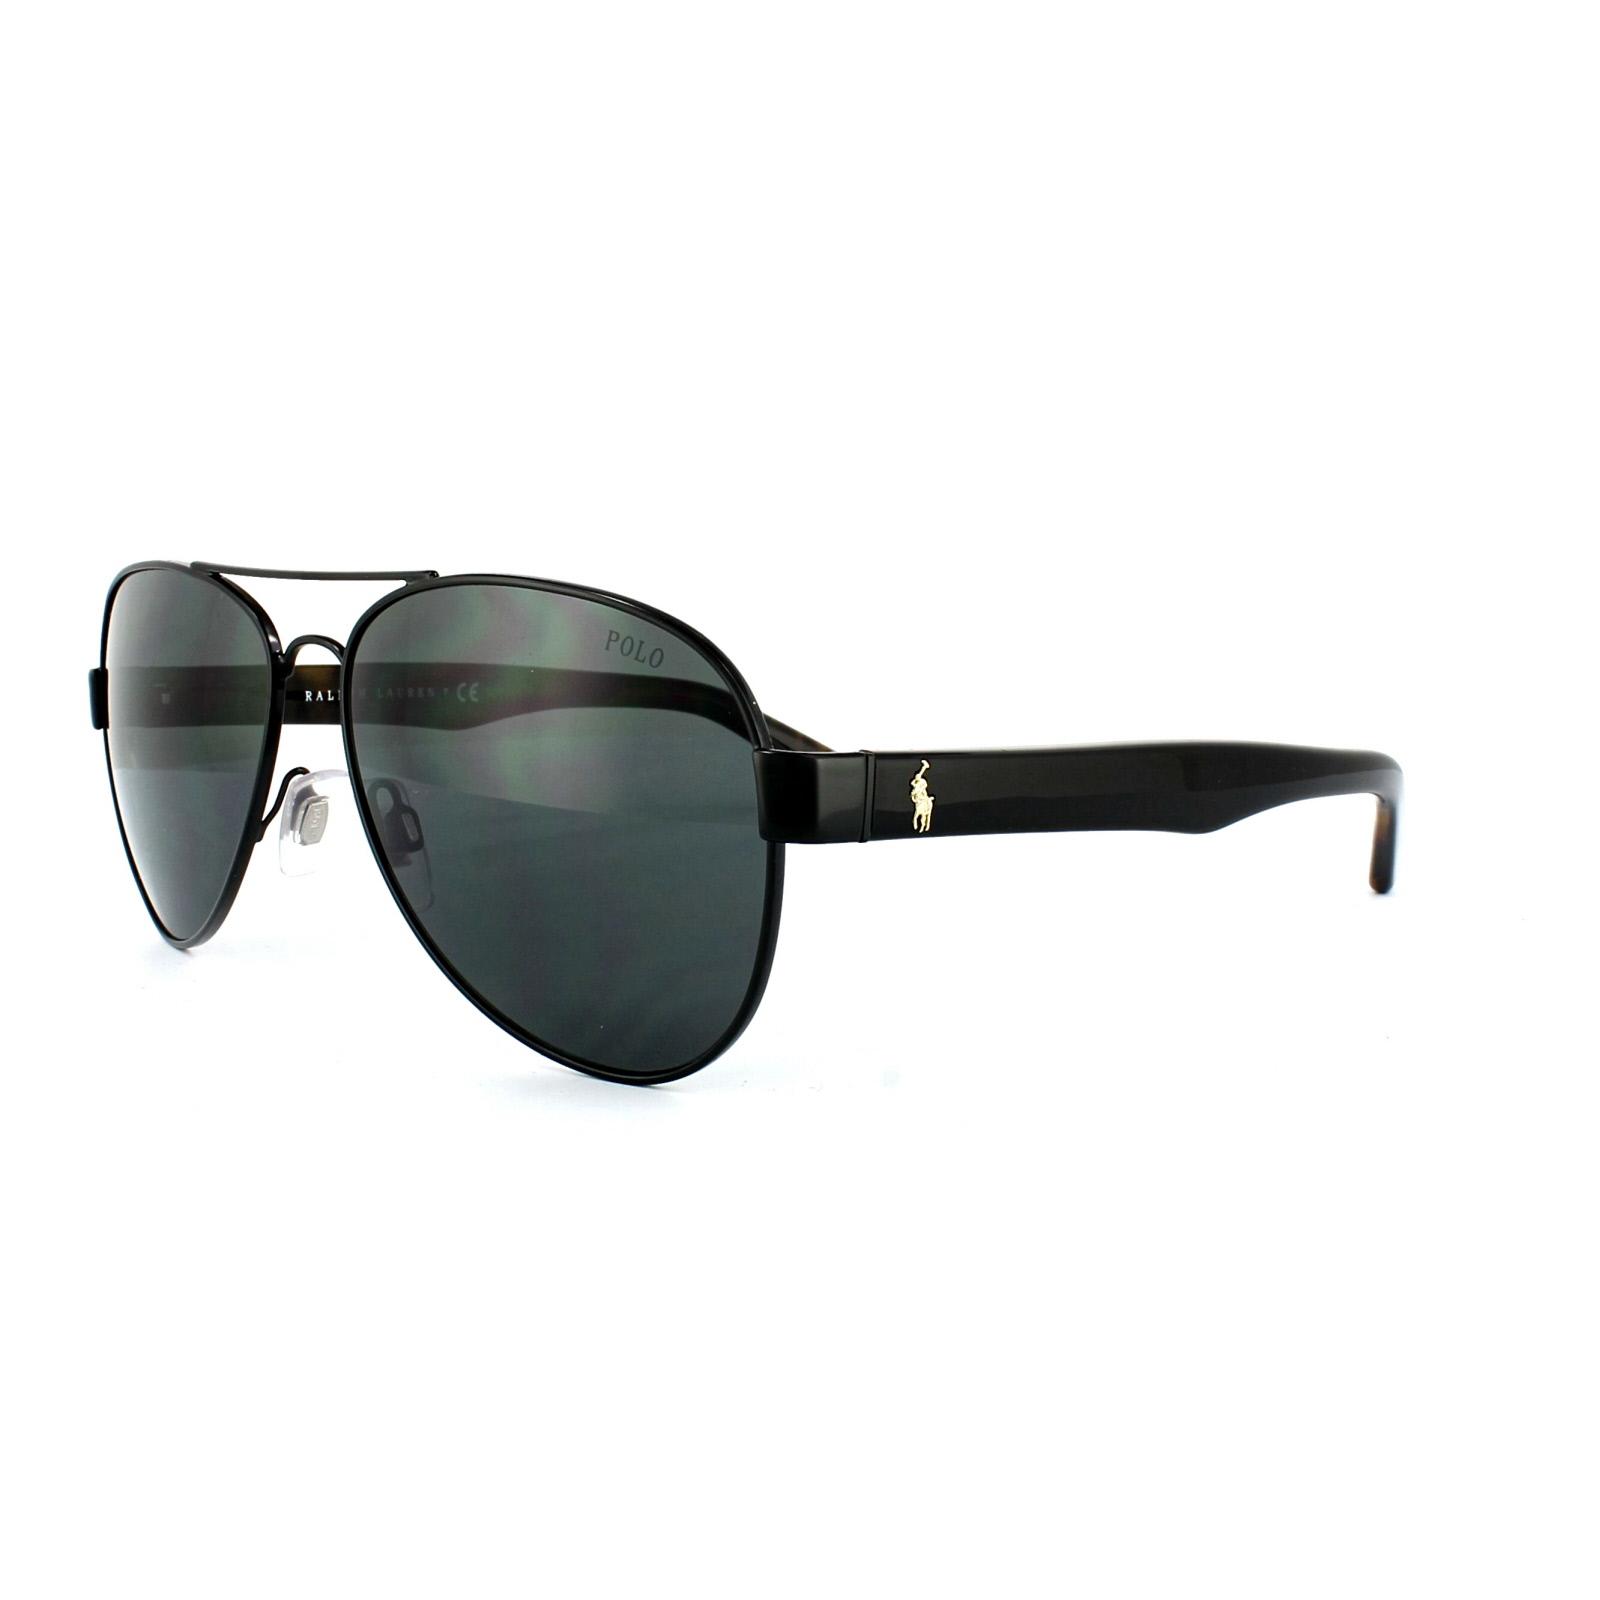 48110cc46241 Cheap Polo Ralph Lauren 3096 Sunglasses - Discounted Sunglasses